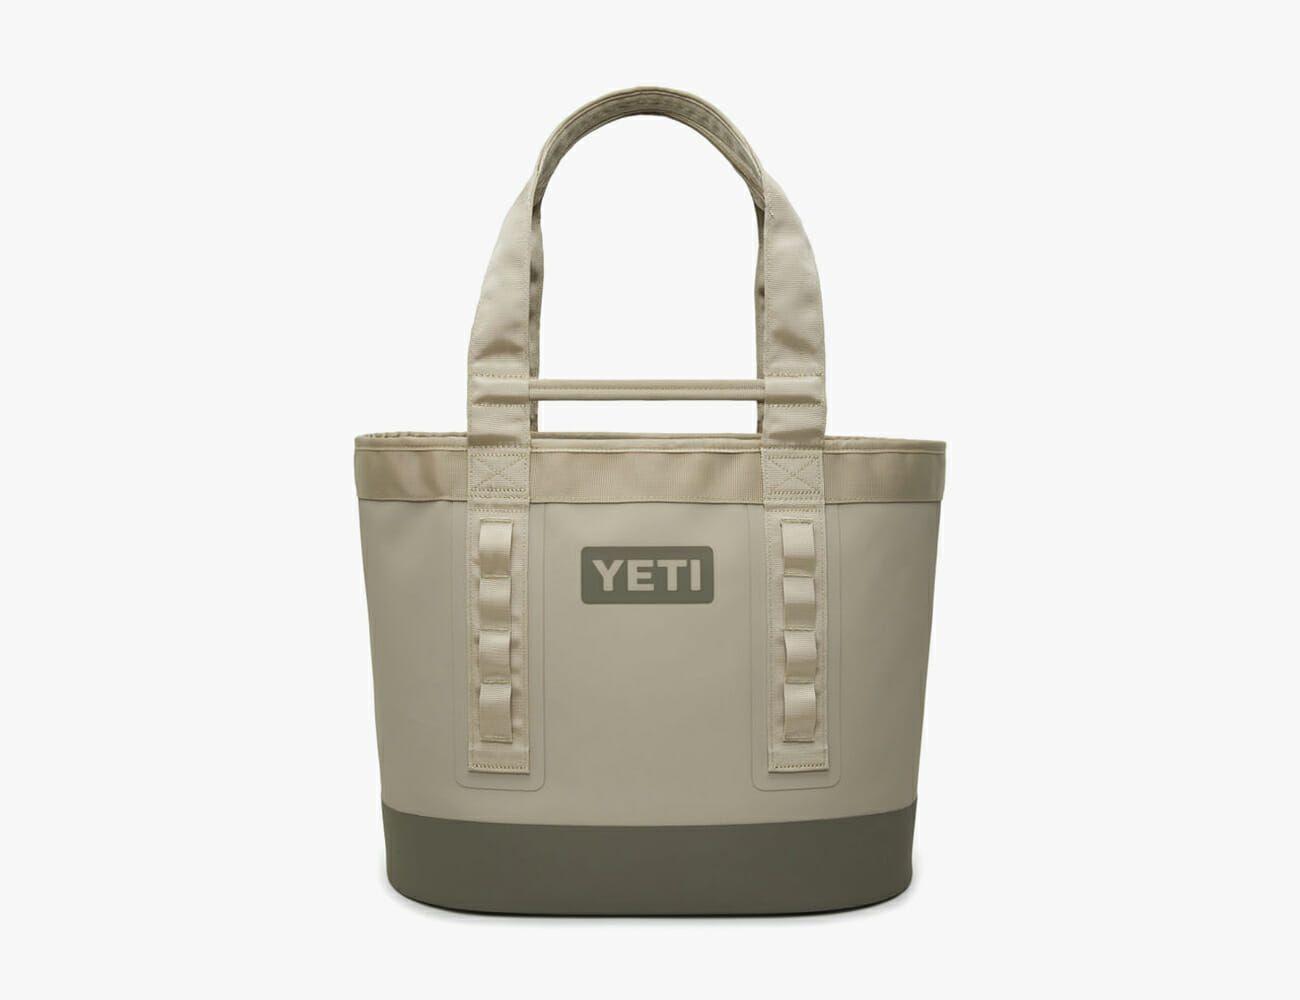 Excellent The Best Tote Bags For Summer 2018 Gear Patrol Inzonedesignstudio Interior Chair Design Inzonedesignstudiocom